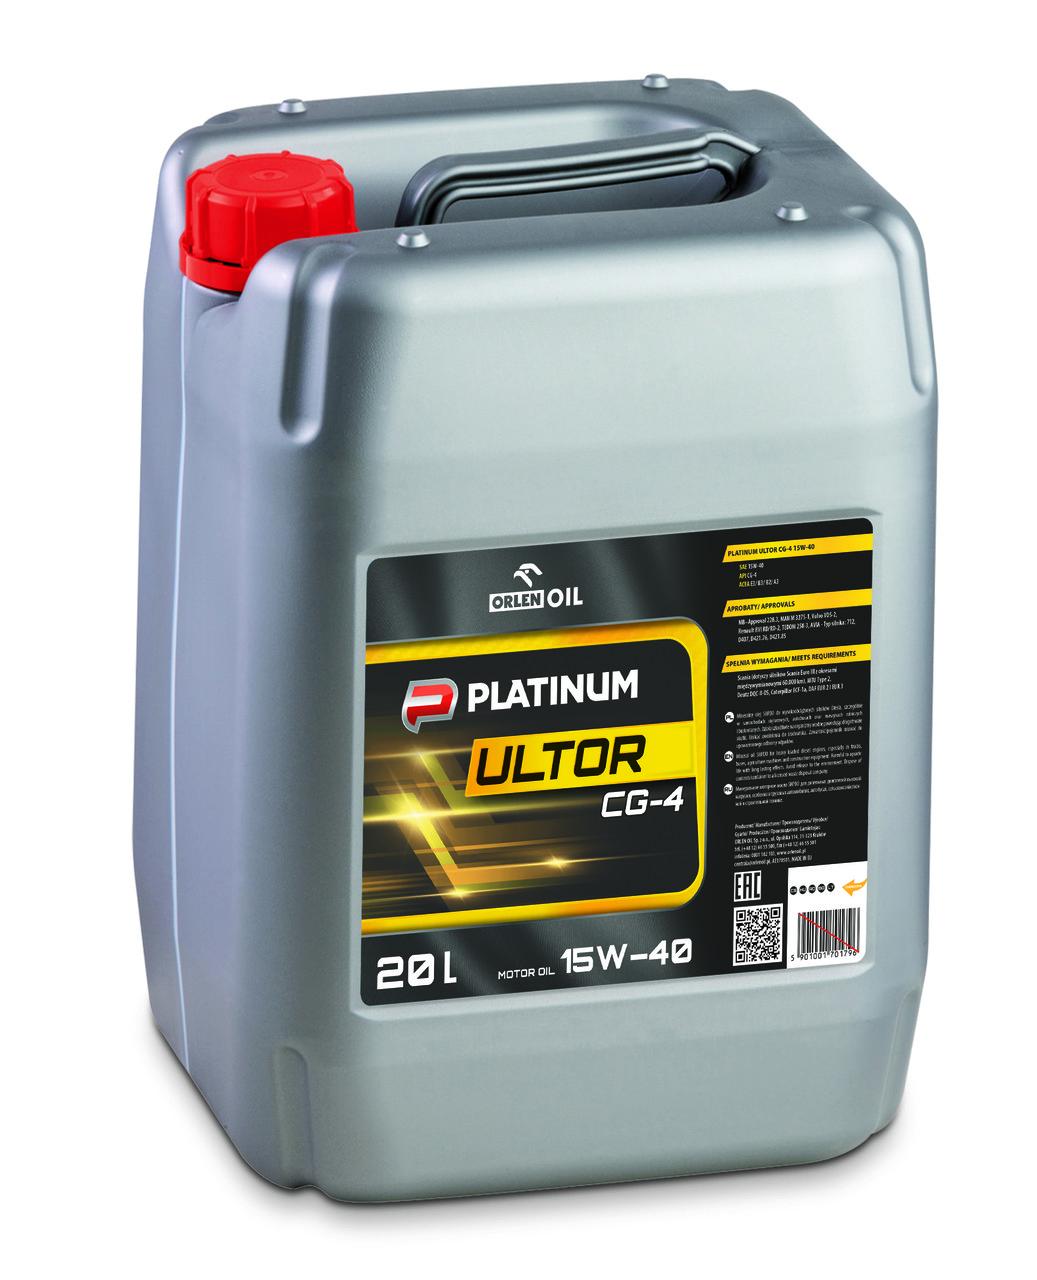 ORLEN Platinum Ultor CG-4 15W-40 20л